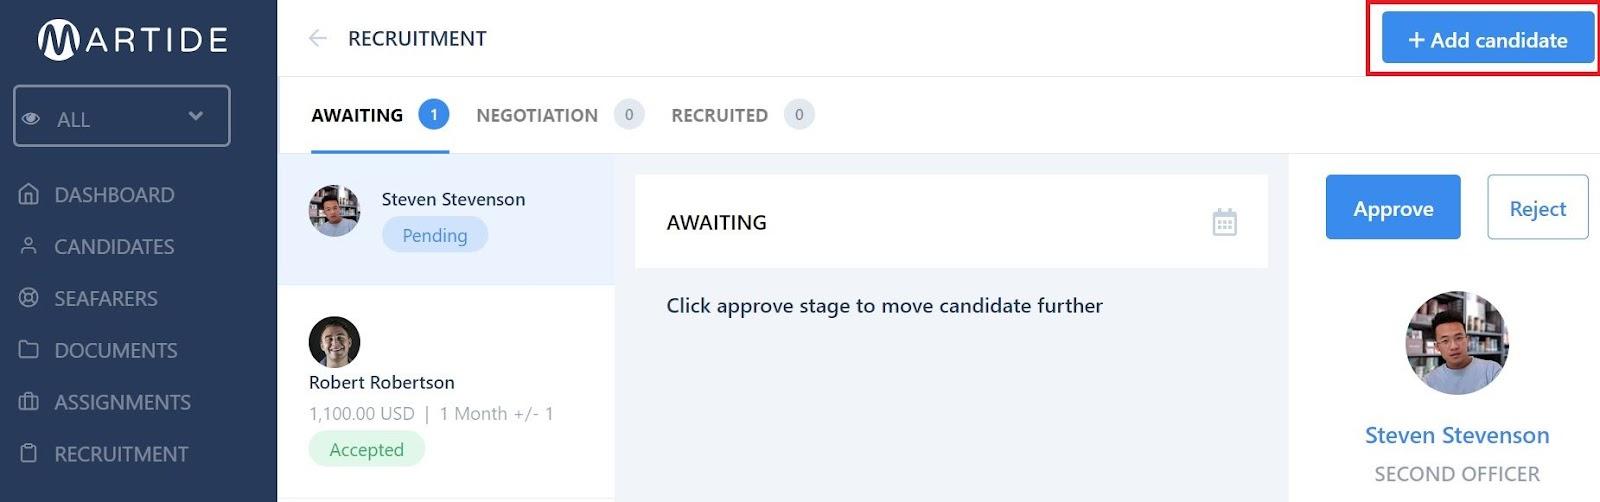 screenshot of a recruitment pipeline.